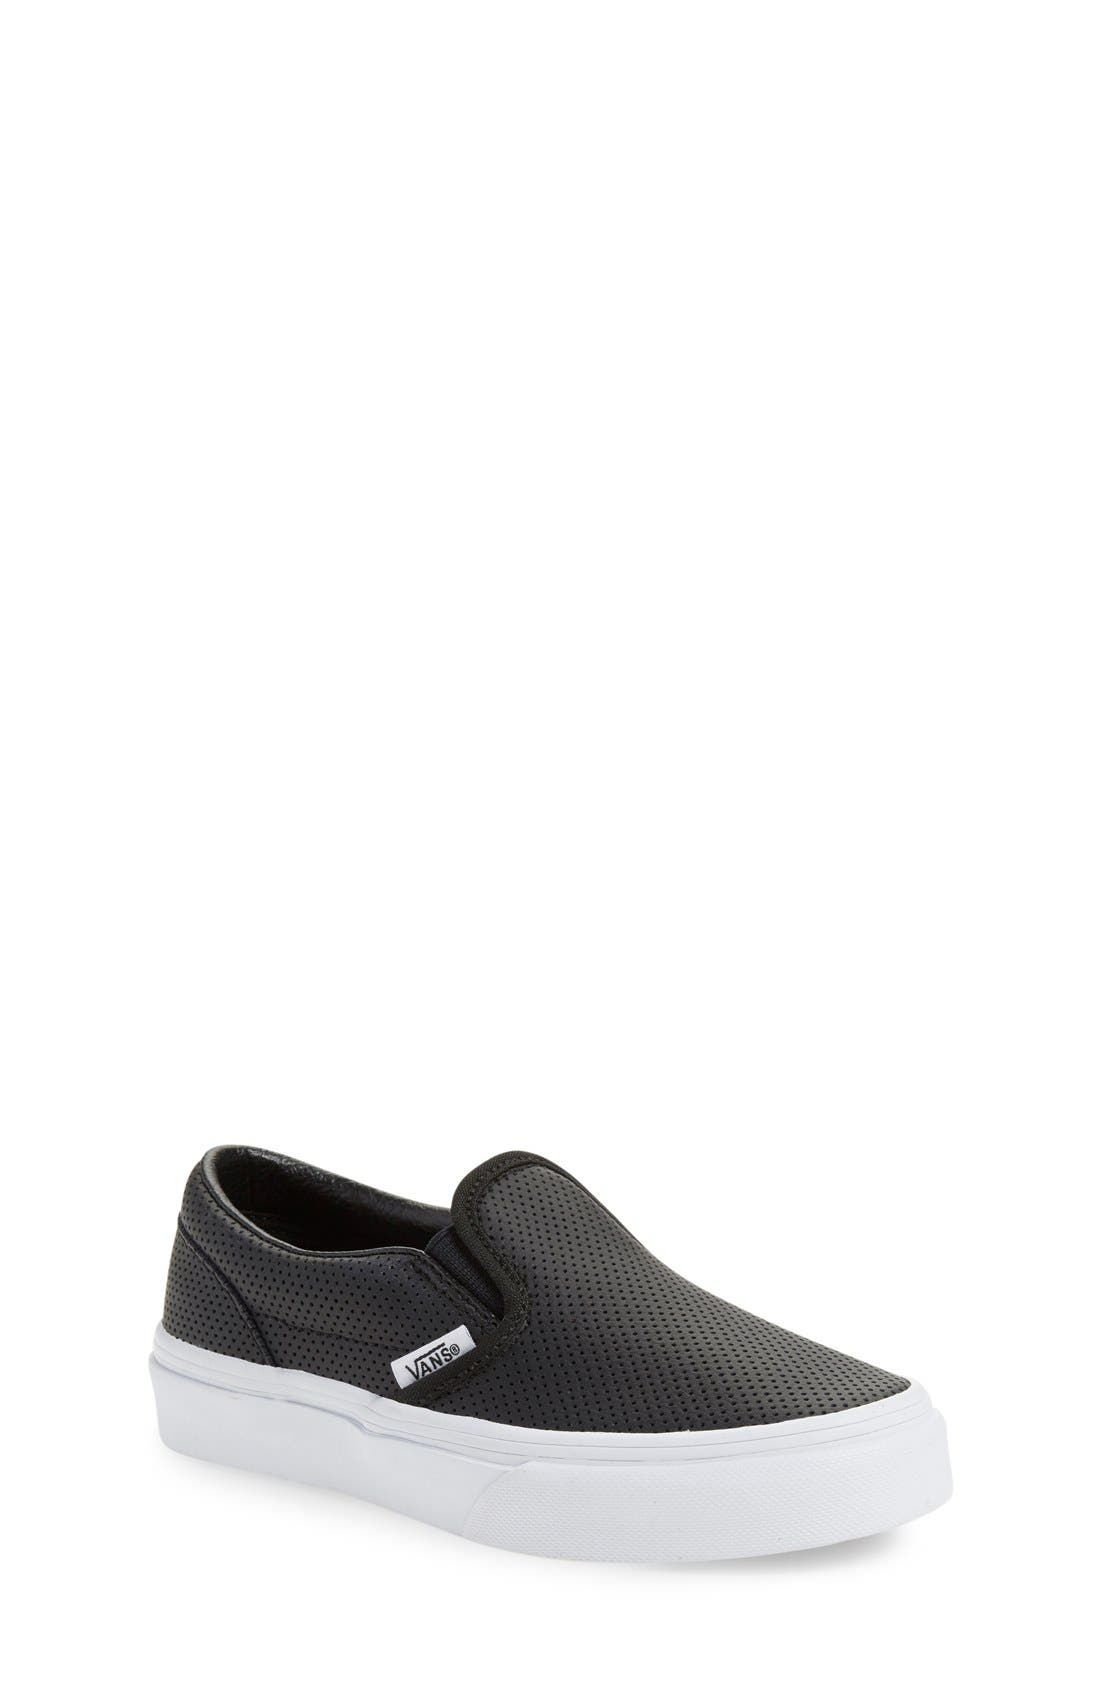 Vans 'Classic' Slip-On Sneaker (Baby